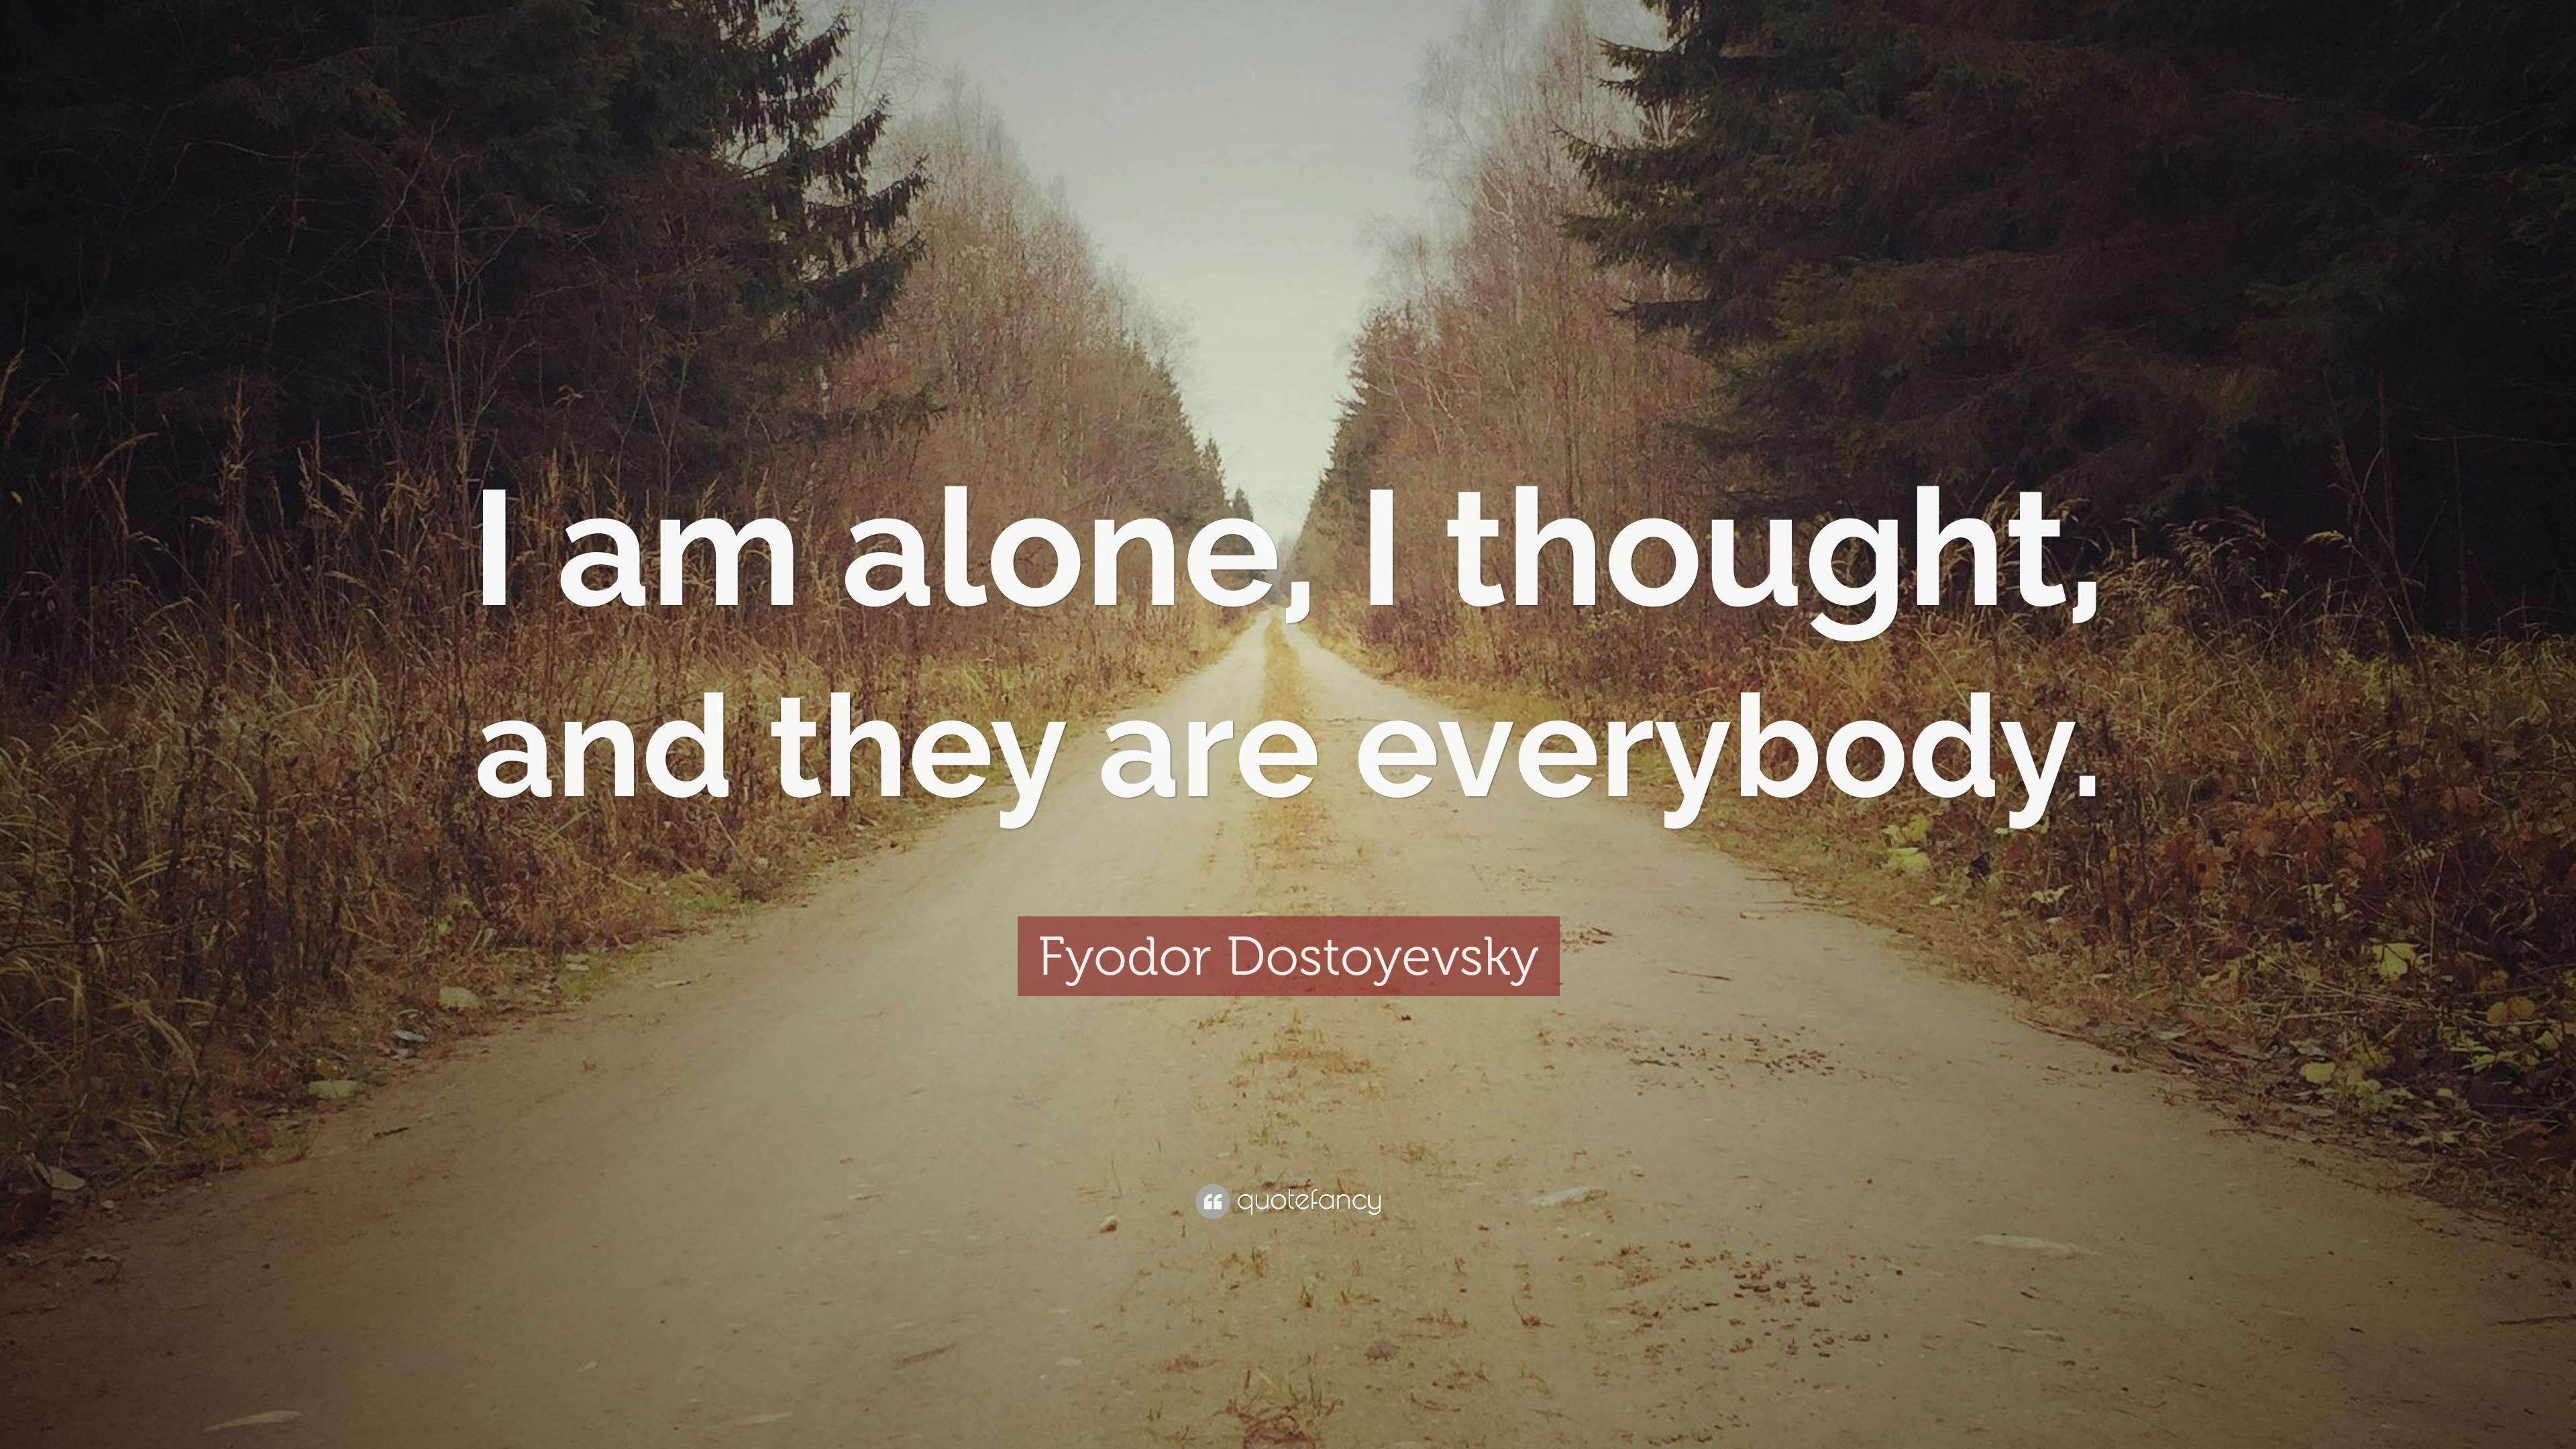 Fyodor Dostoyevsky Quotes (100 Wallpapers)